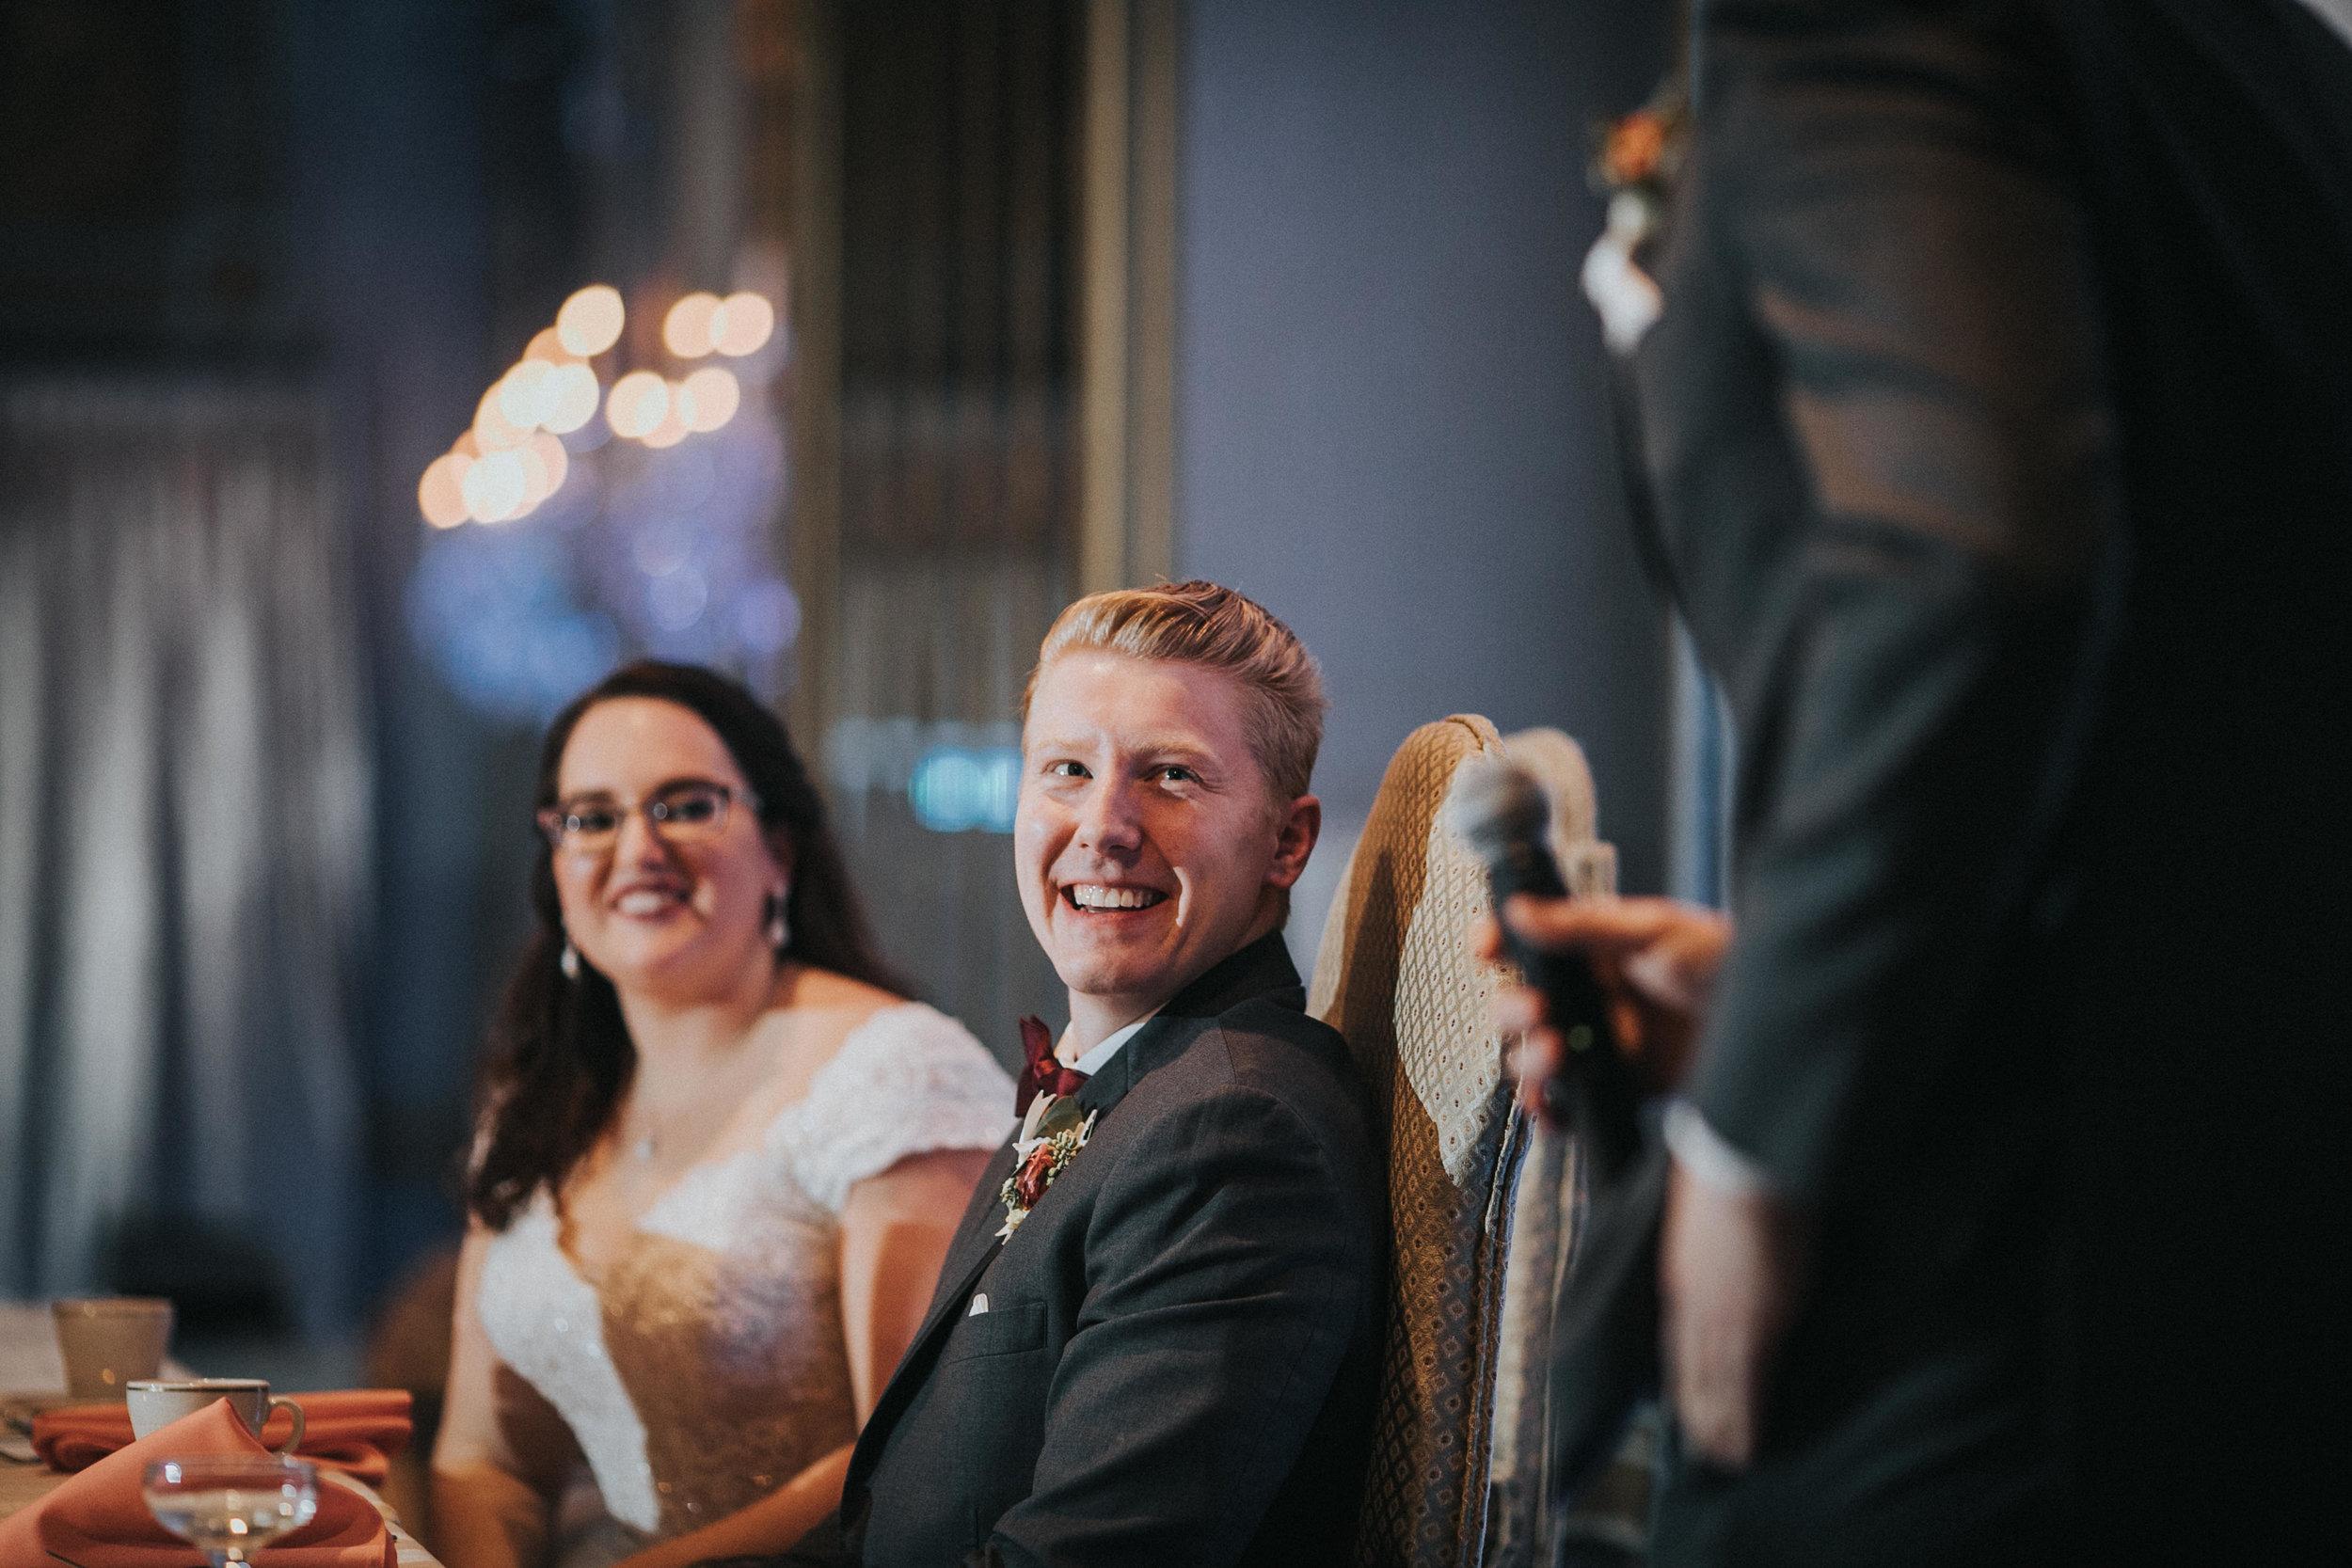 New-Jersey-Wedding-Photography-Fishers-Tudor-House-JennaLynnPhotography-Reception-Kathleen&Eddie-142.jpg